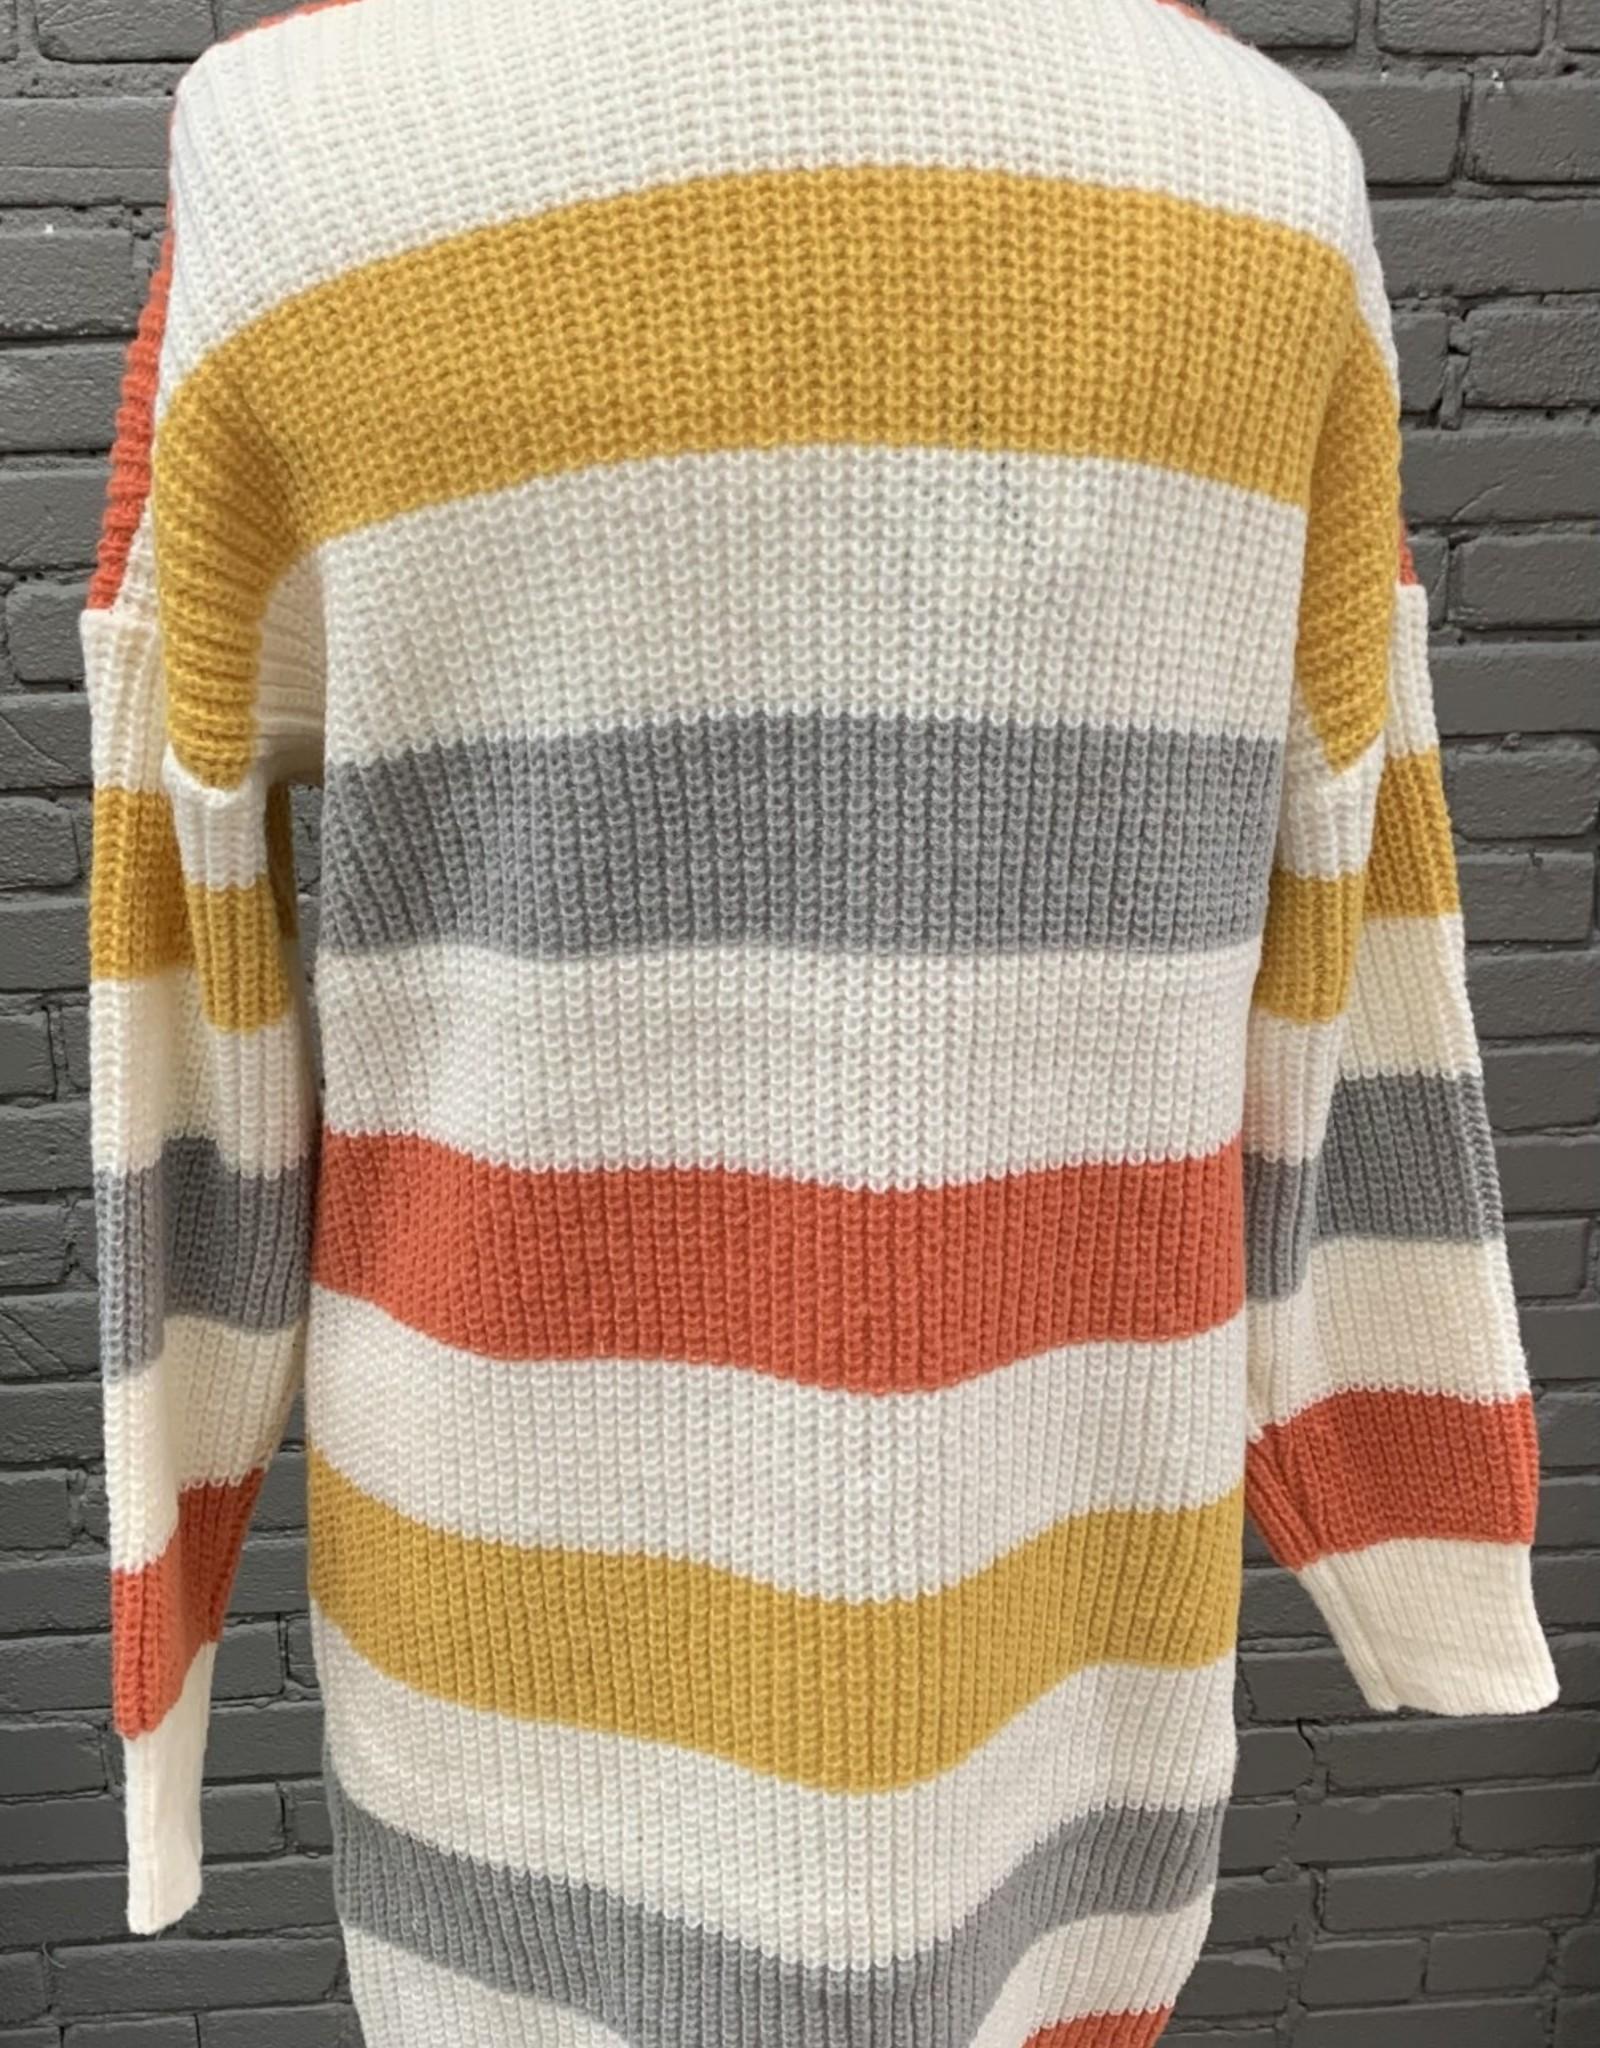 Cardigan Meara stripped knit cardigan